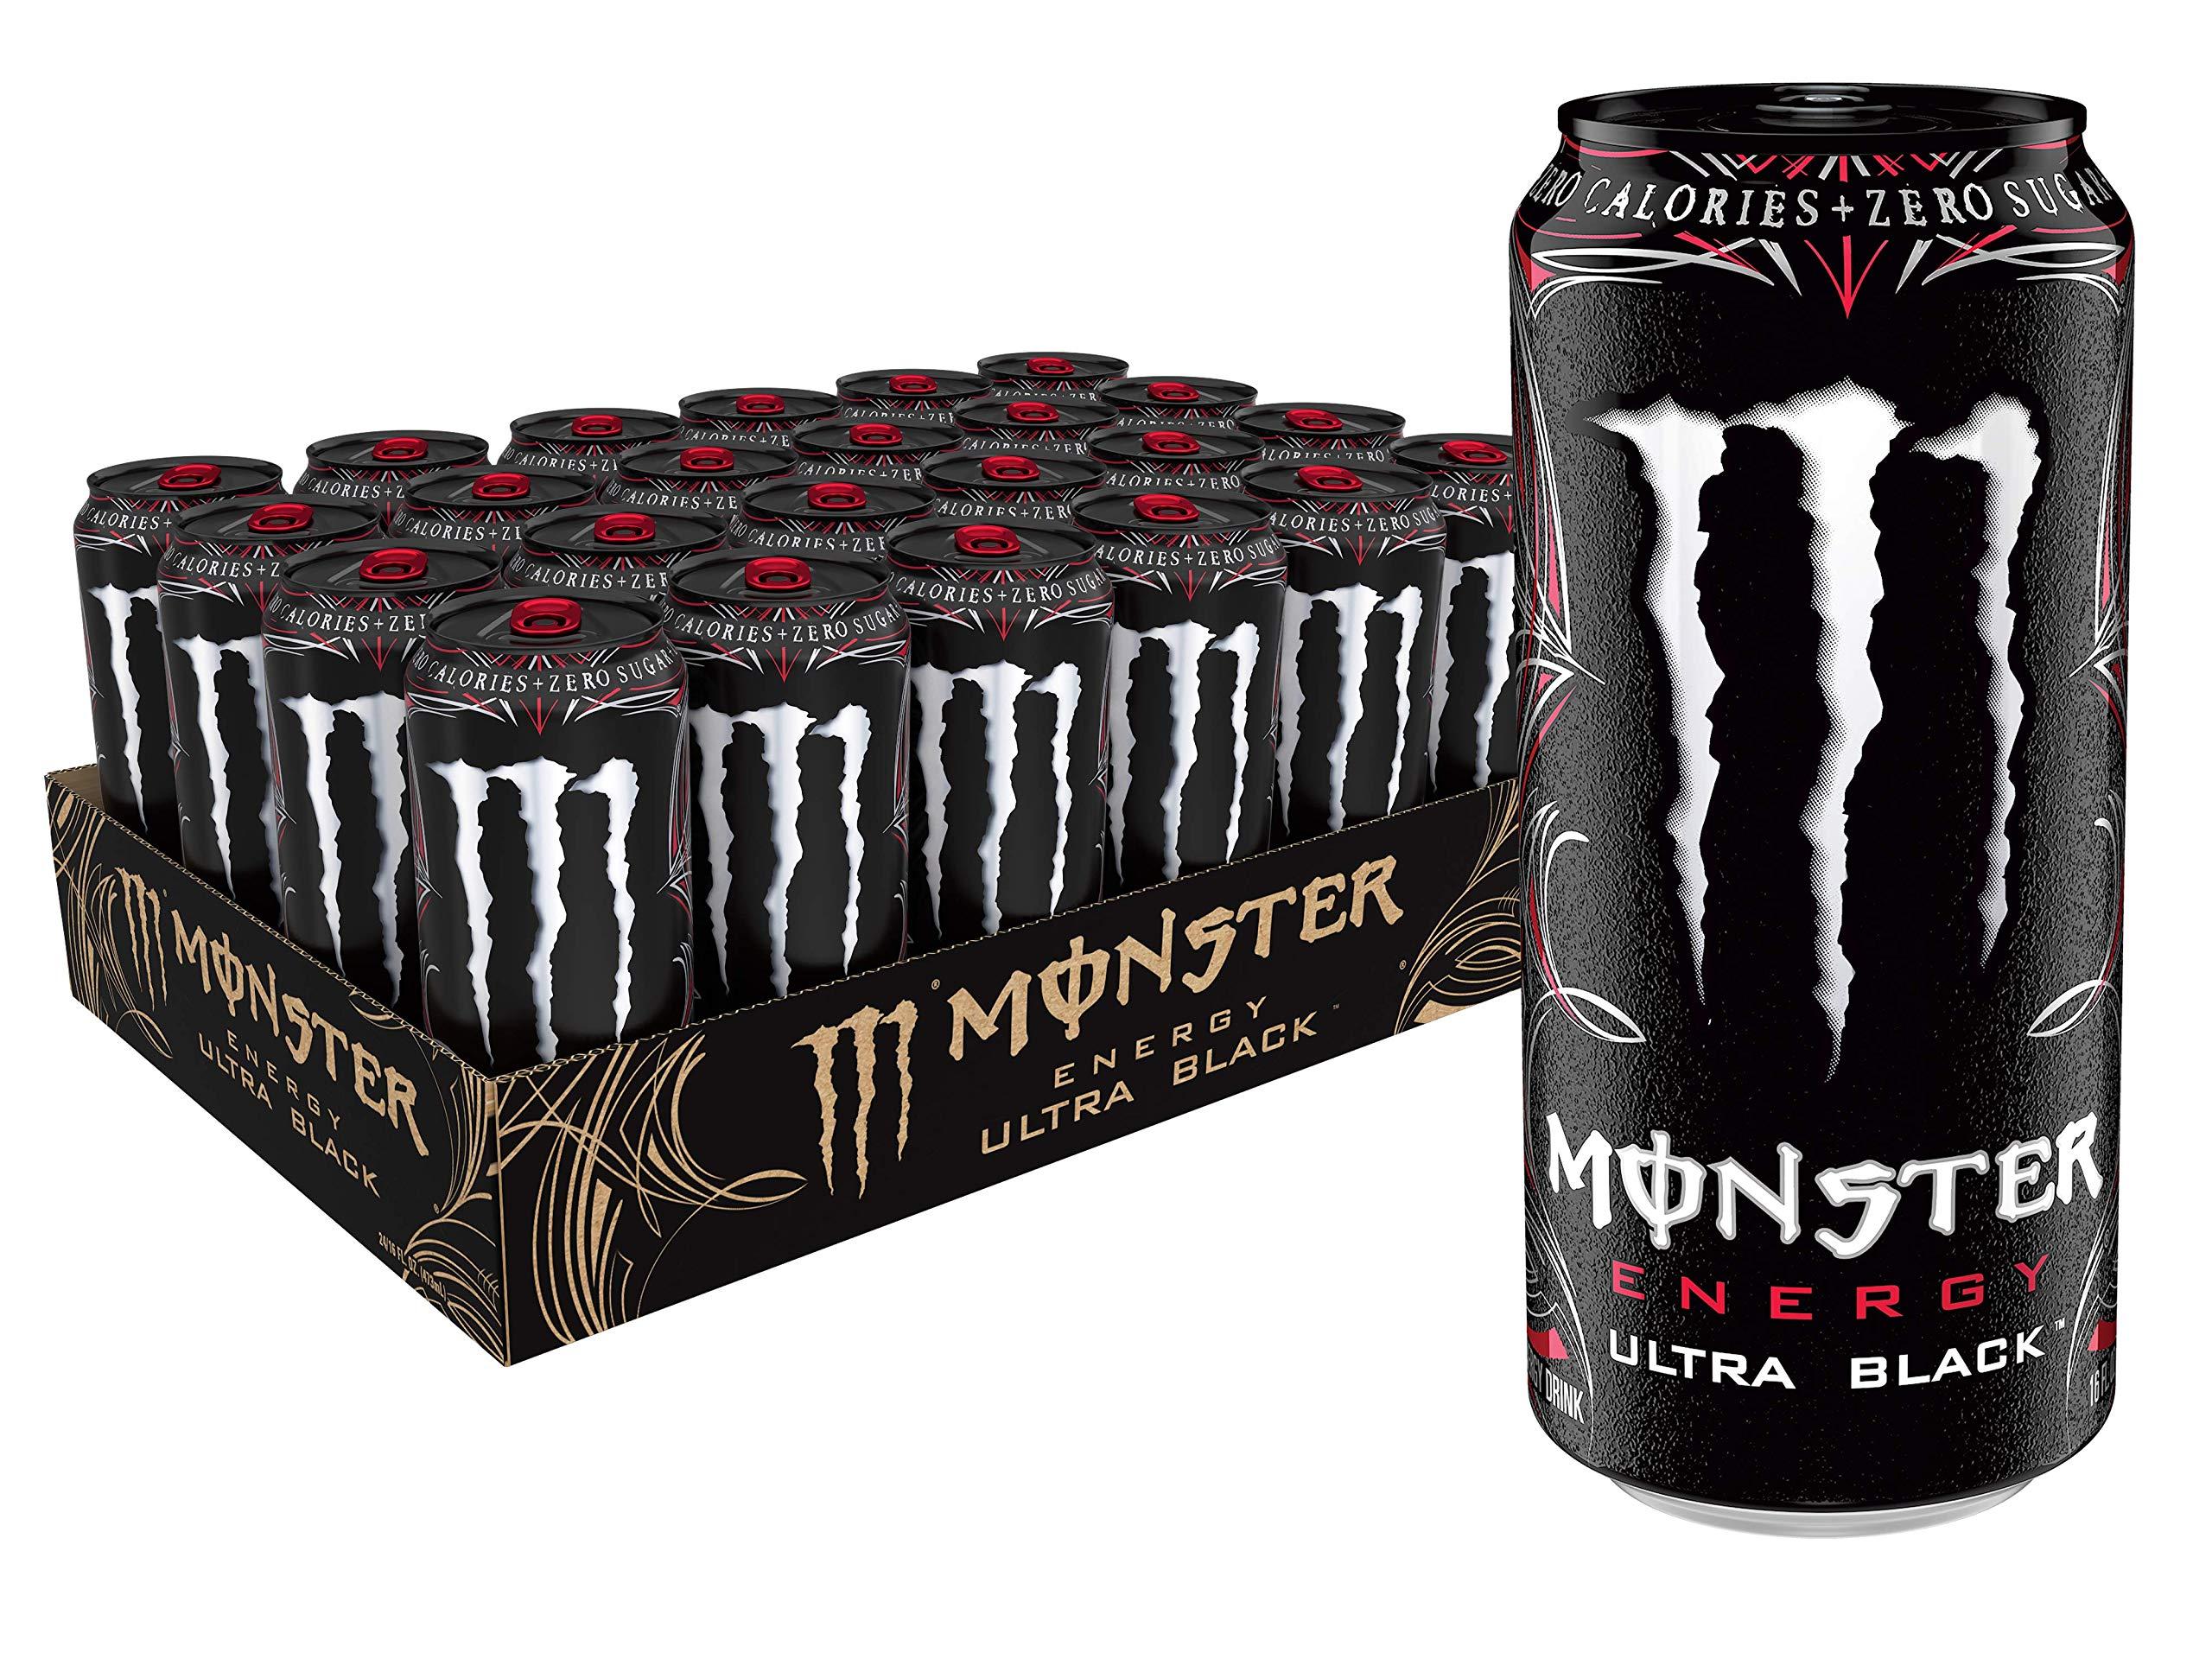 Monster Energy Ultra Black, Sugar Free Energy Drink, 16 Ounce (Pack of 24)